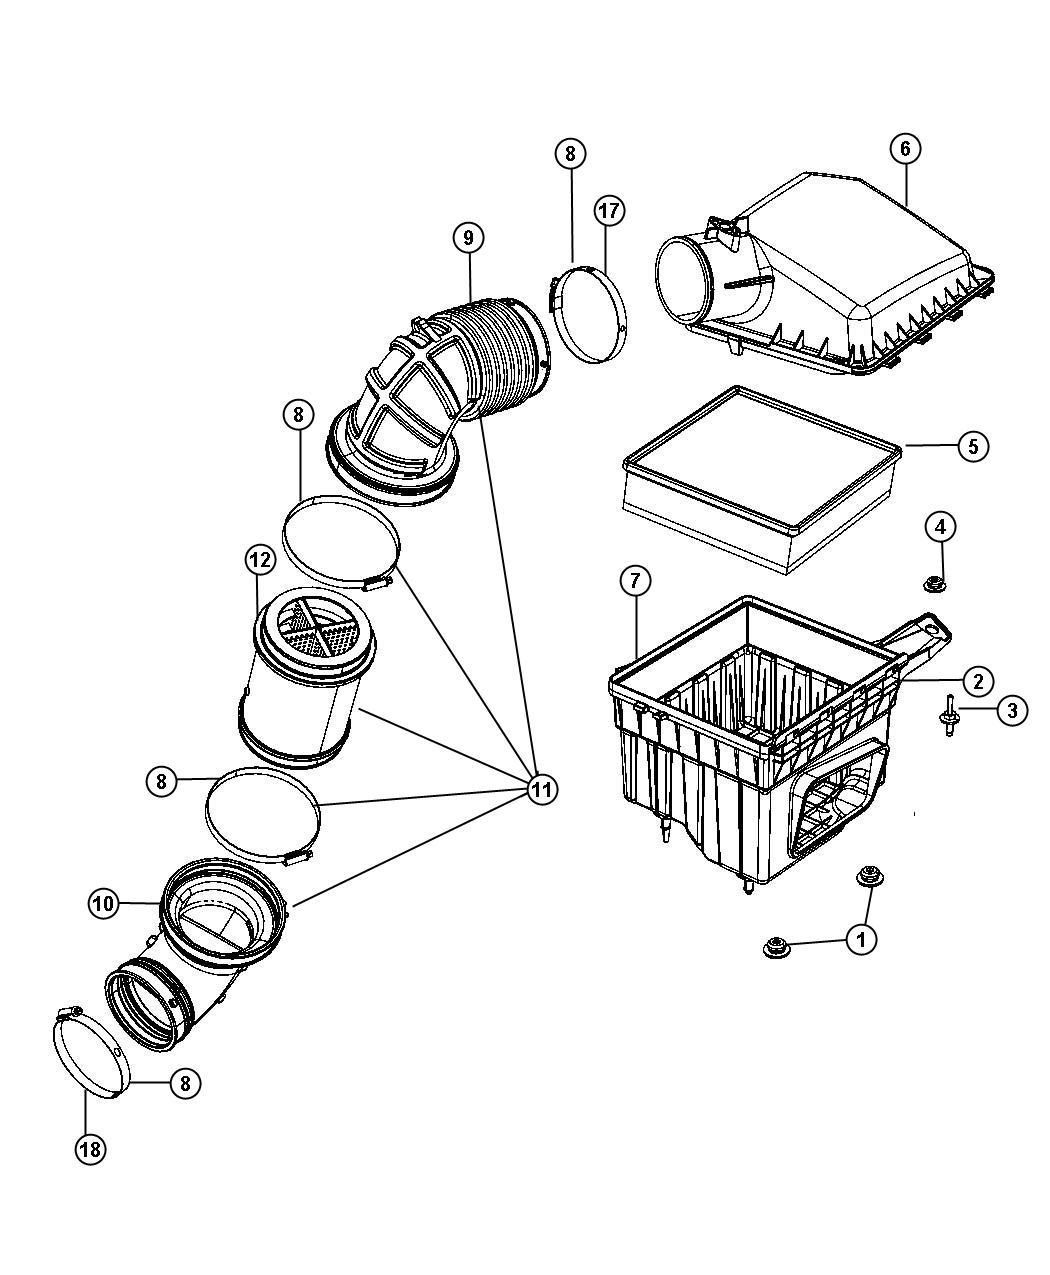 2008 Dodge Ram 2500 Gauge, sensor. Air flow, air